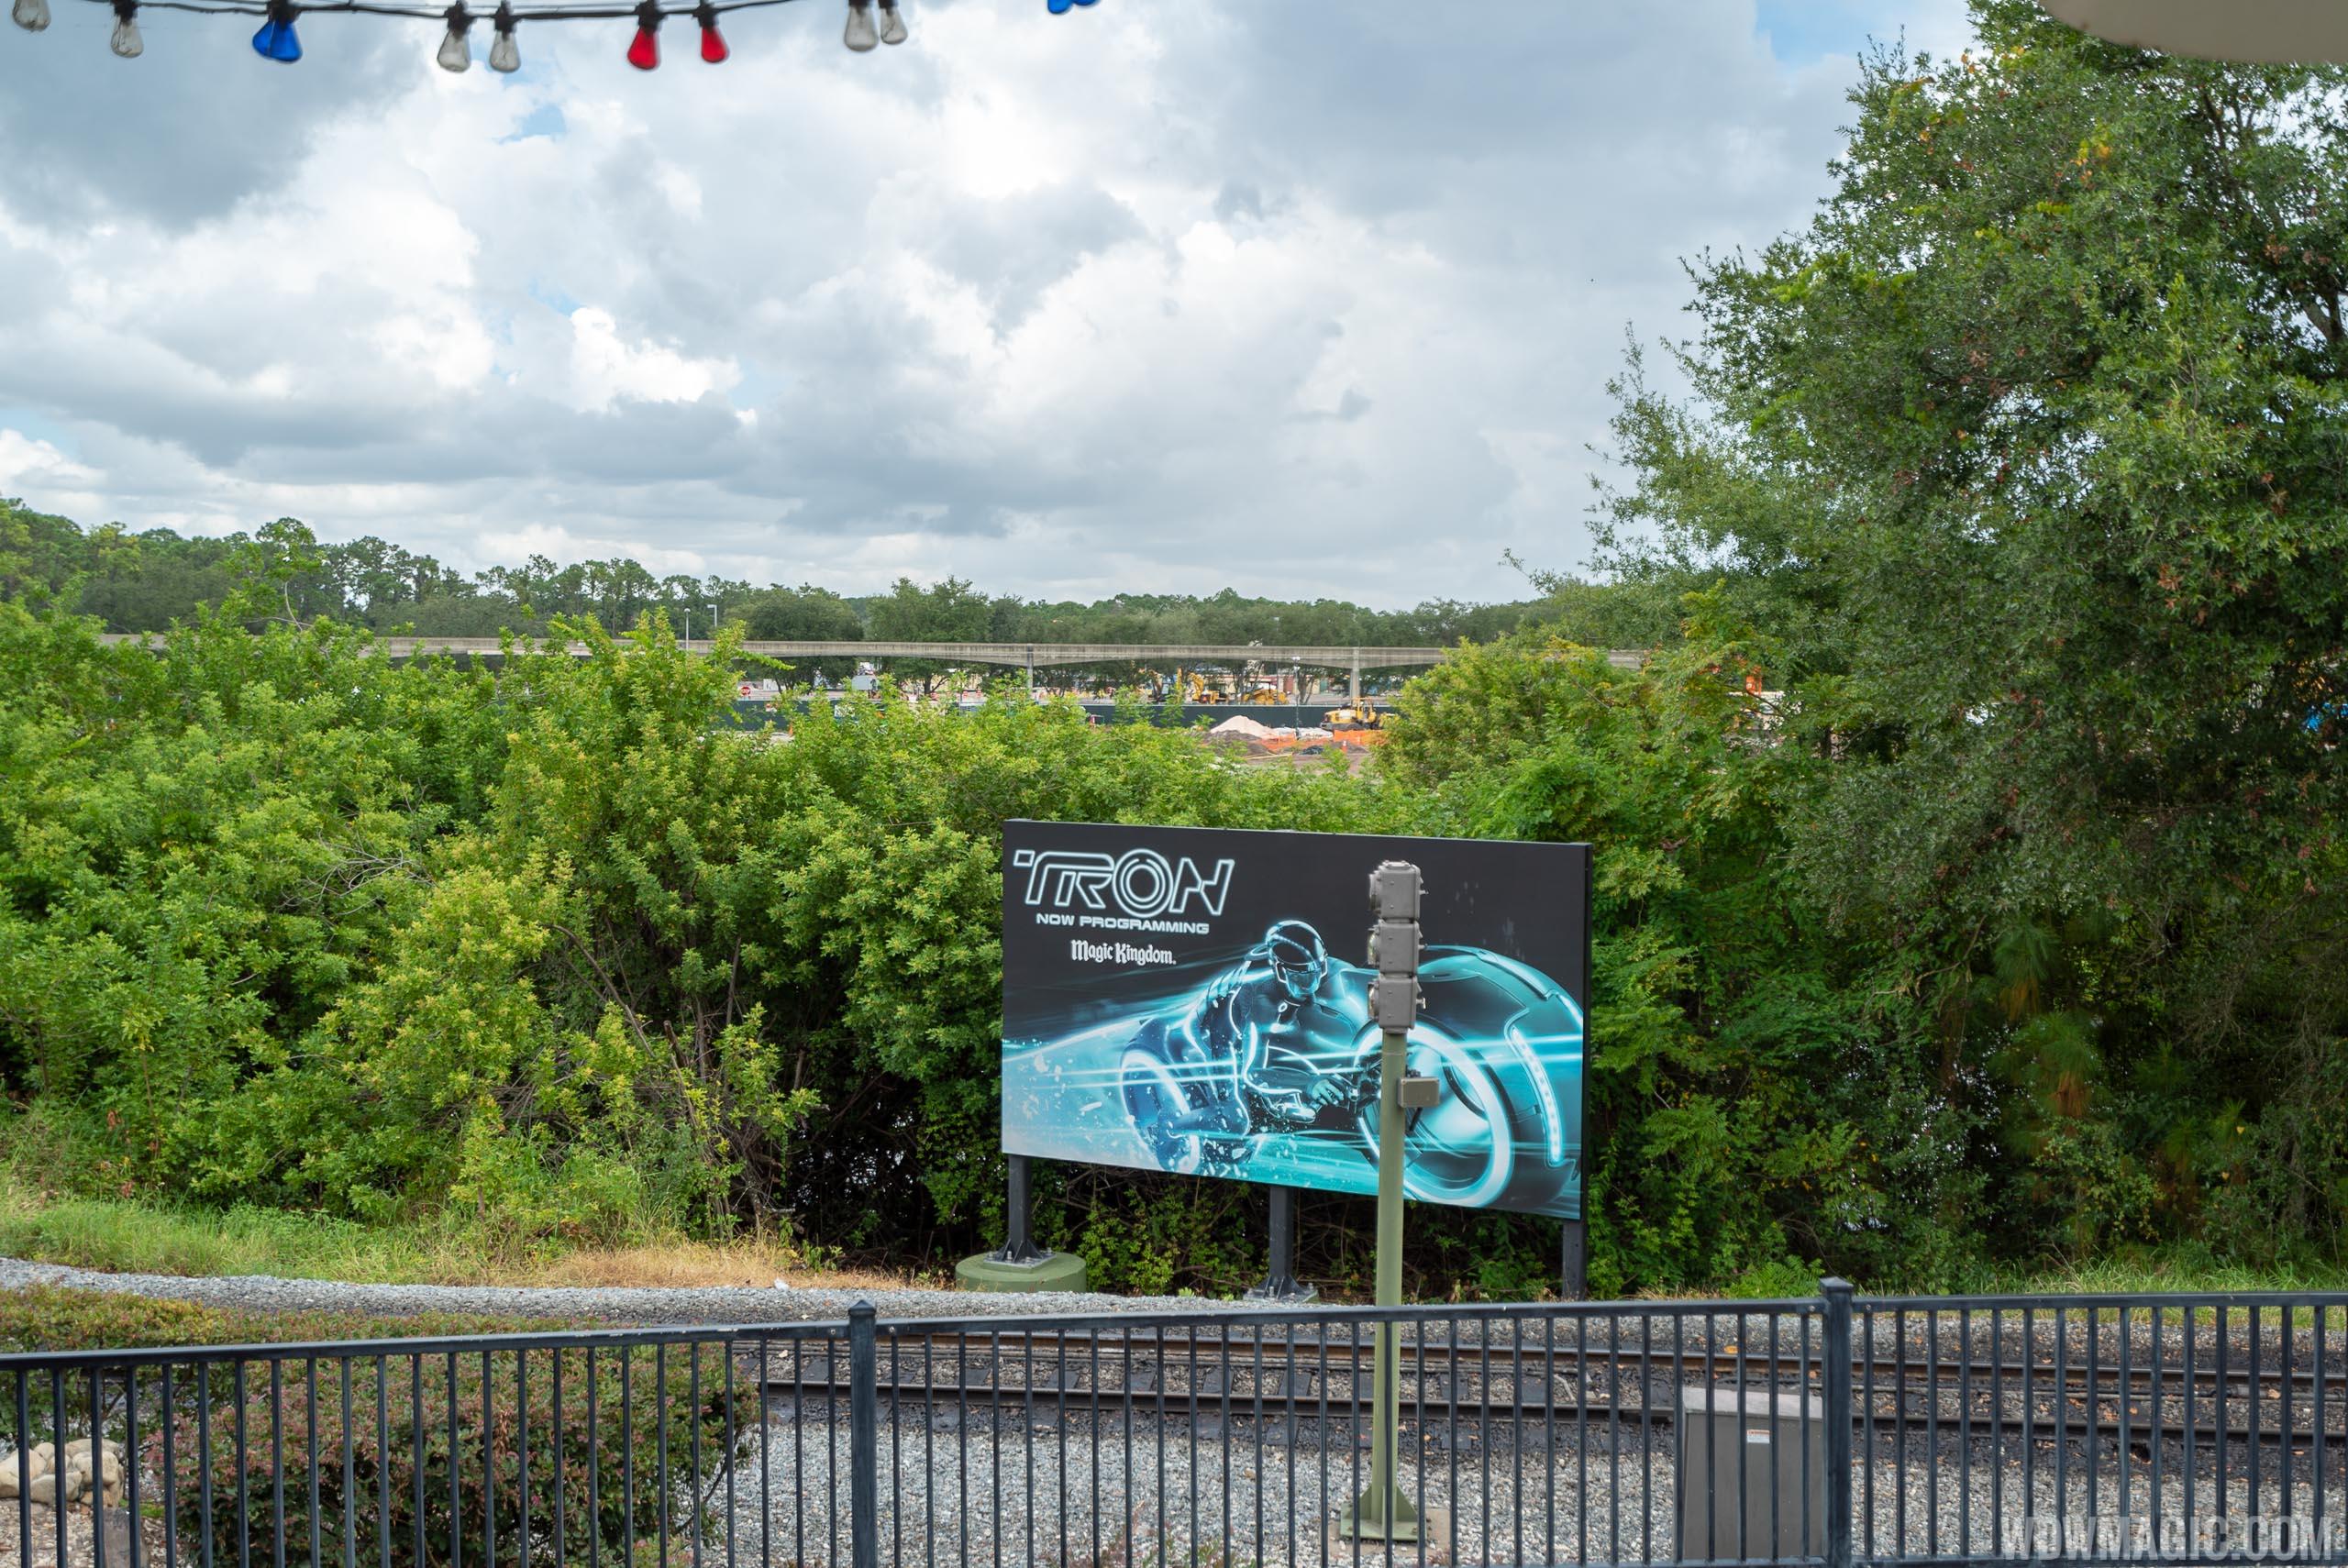 Tron construction site - September 2018